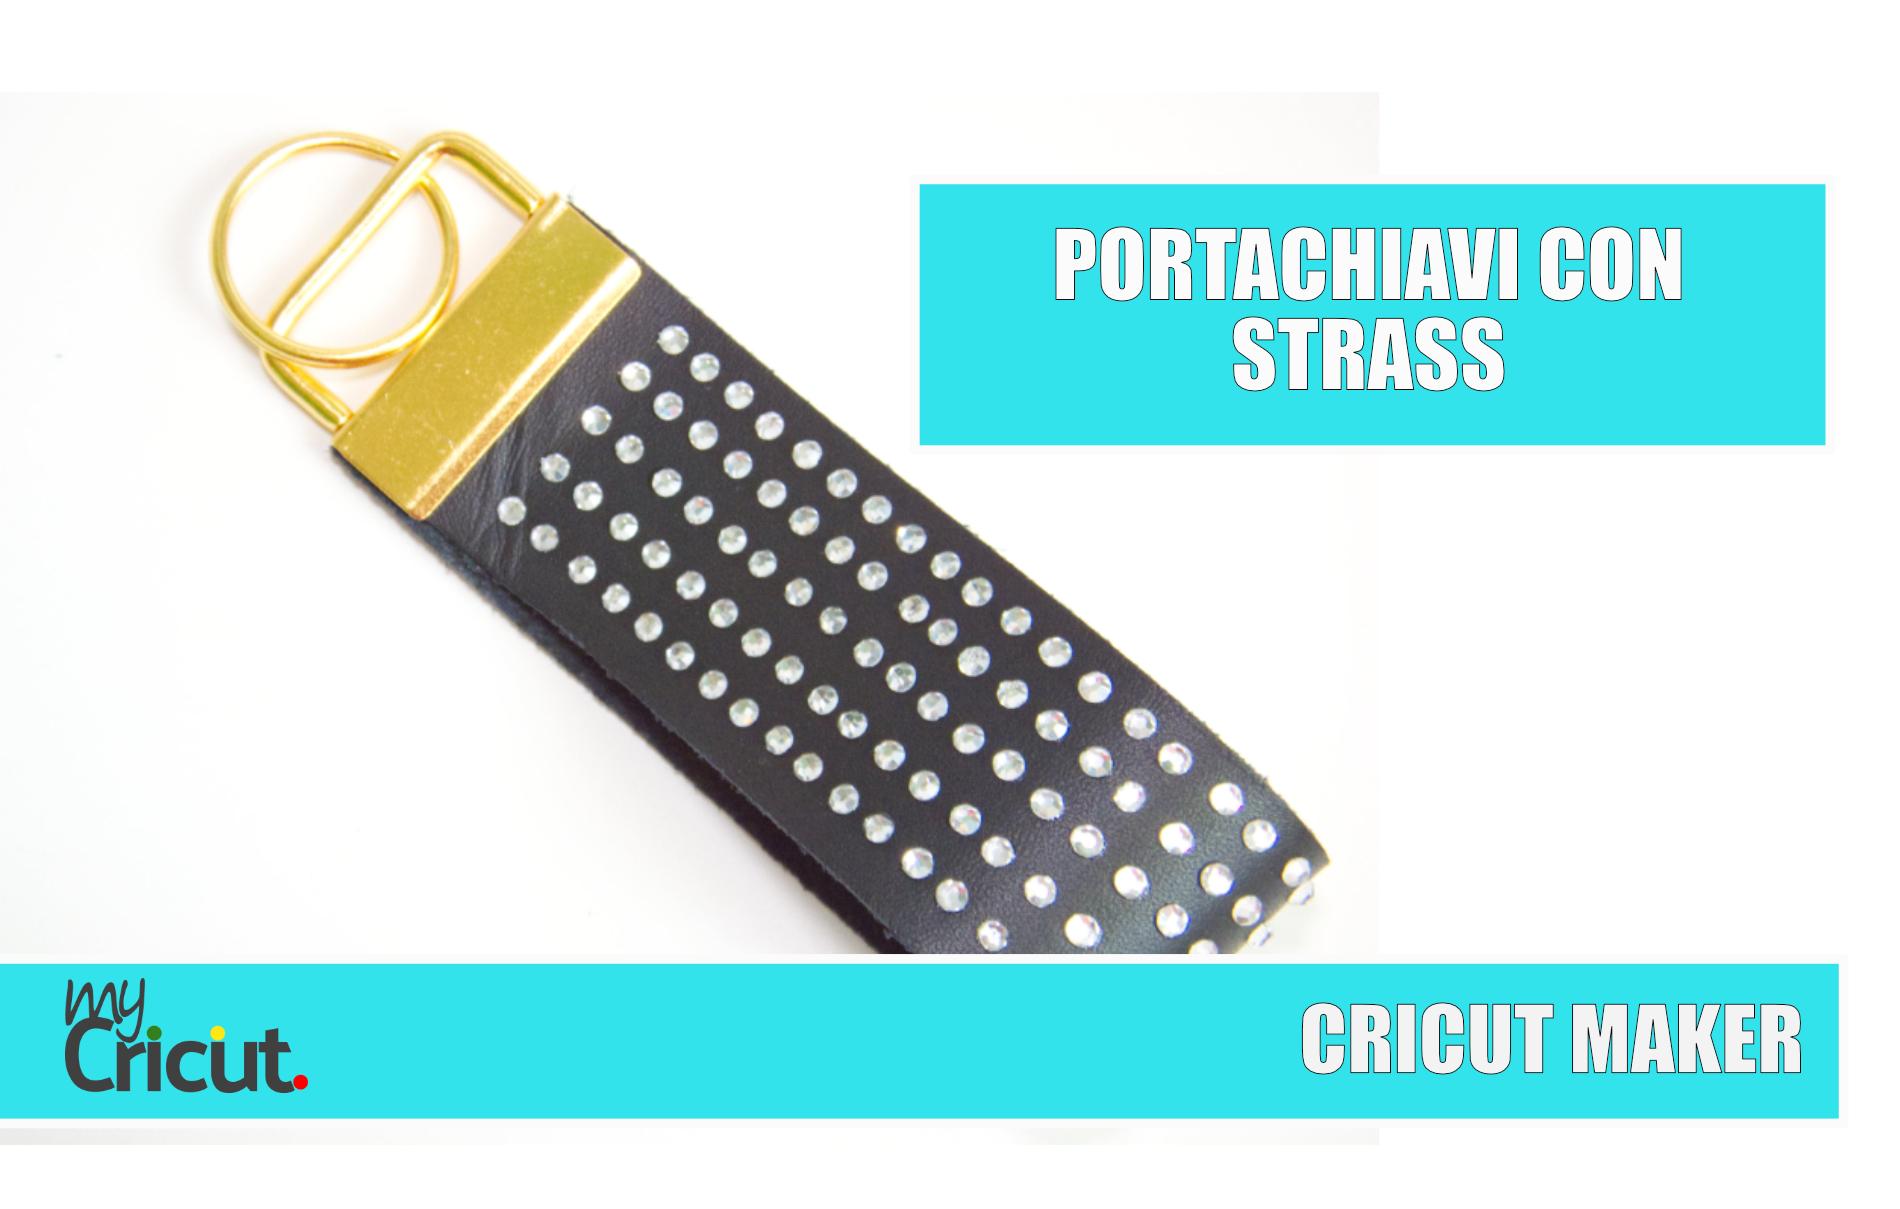 PORTACHIAVI PELLE STRASS CRICUT